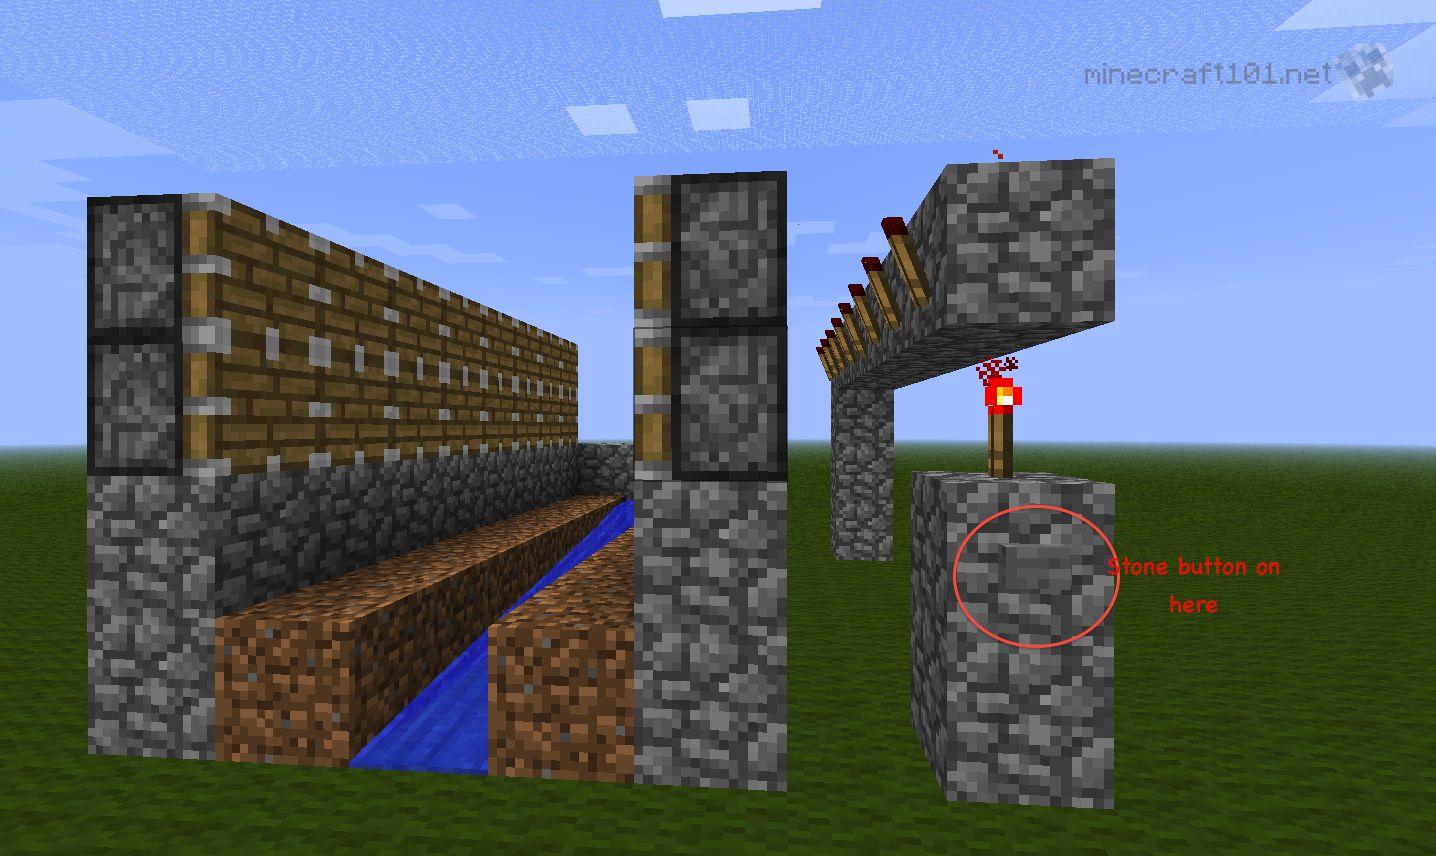 Minecraft Guide: Farming Sugar Cane